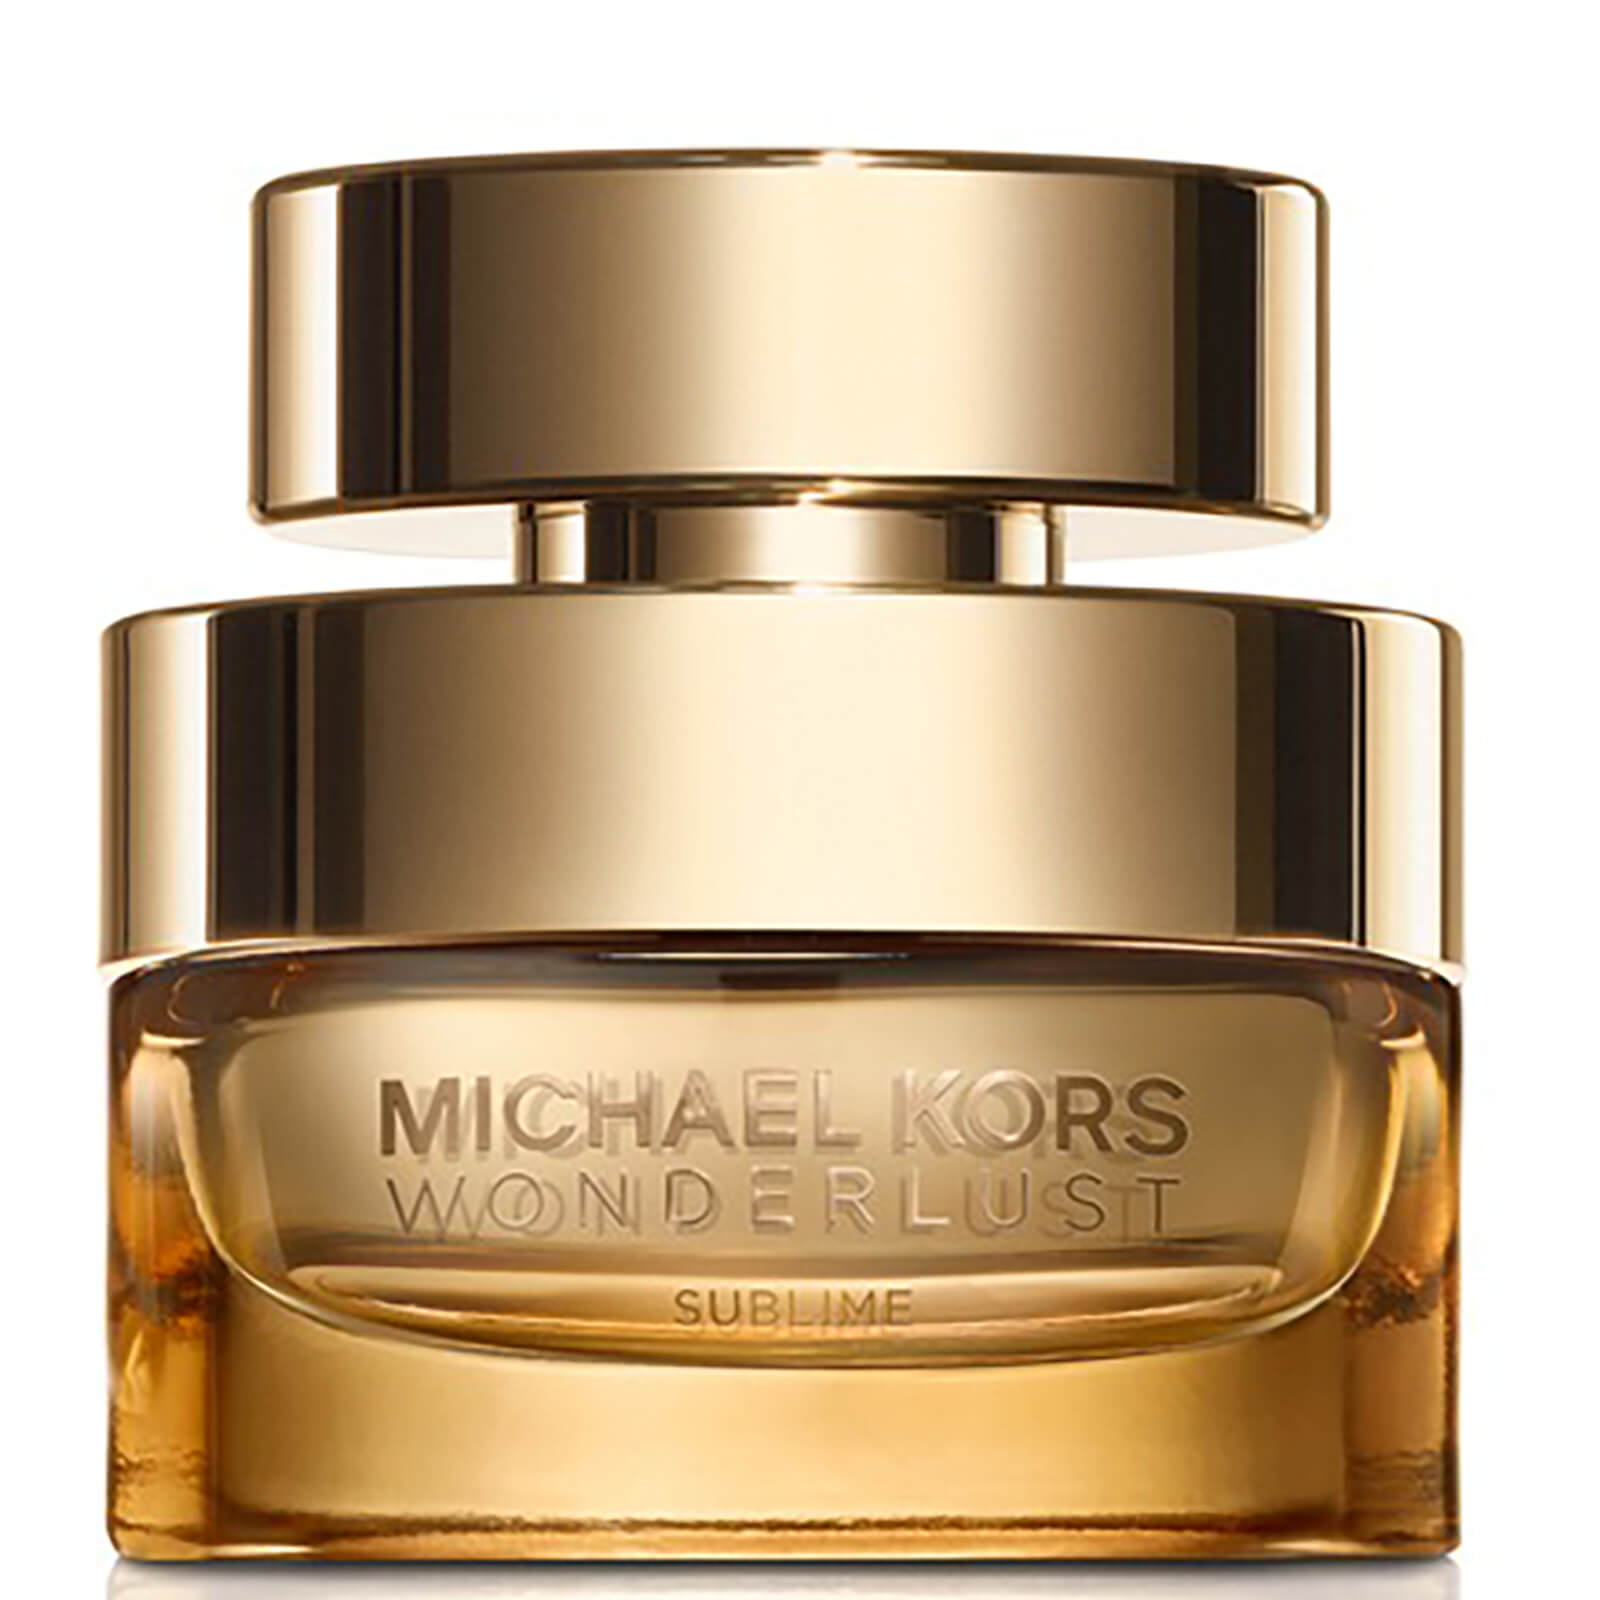 Michael Kors - Wonderlust Sublime EDP 30 ml